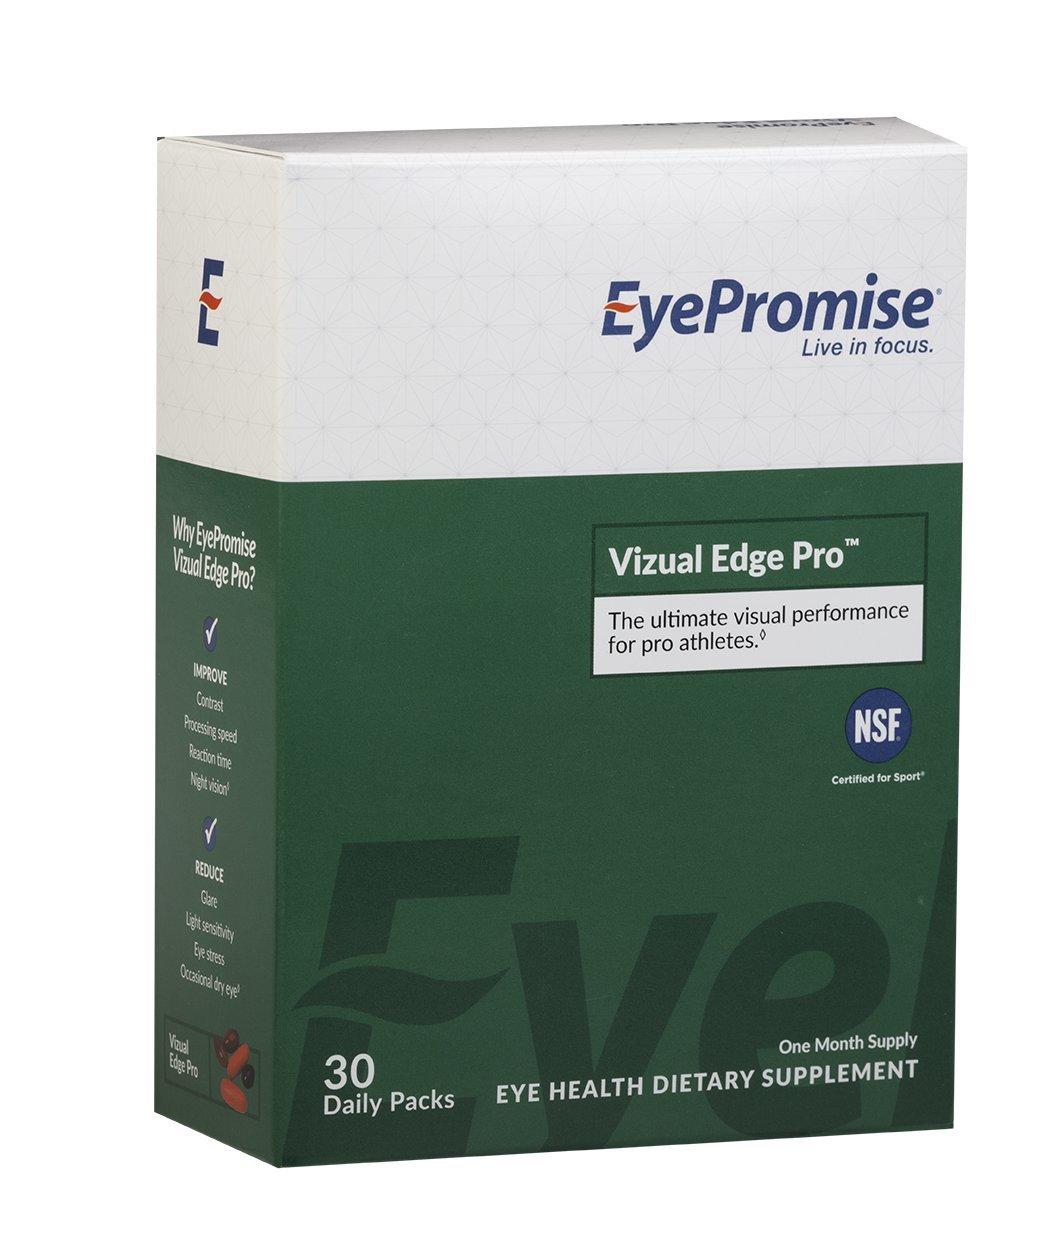 Eyepromise Vizual Edge Pro - 1 Month Supply | Performance Eye Vitamin with Zeaxanthin, Lutein, Omega-3 Fish Oil & Vitamin D